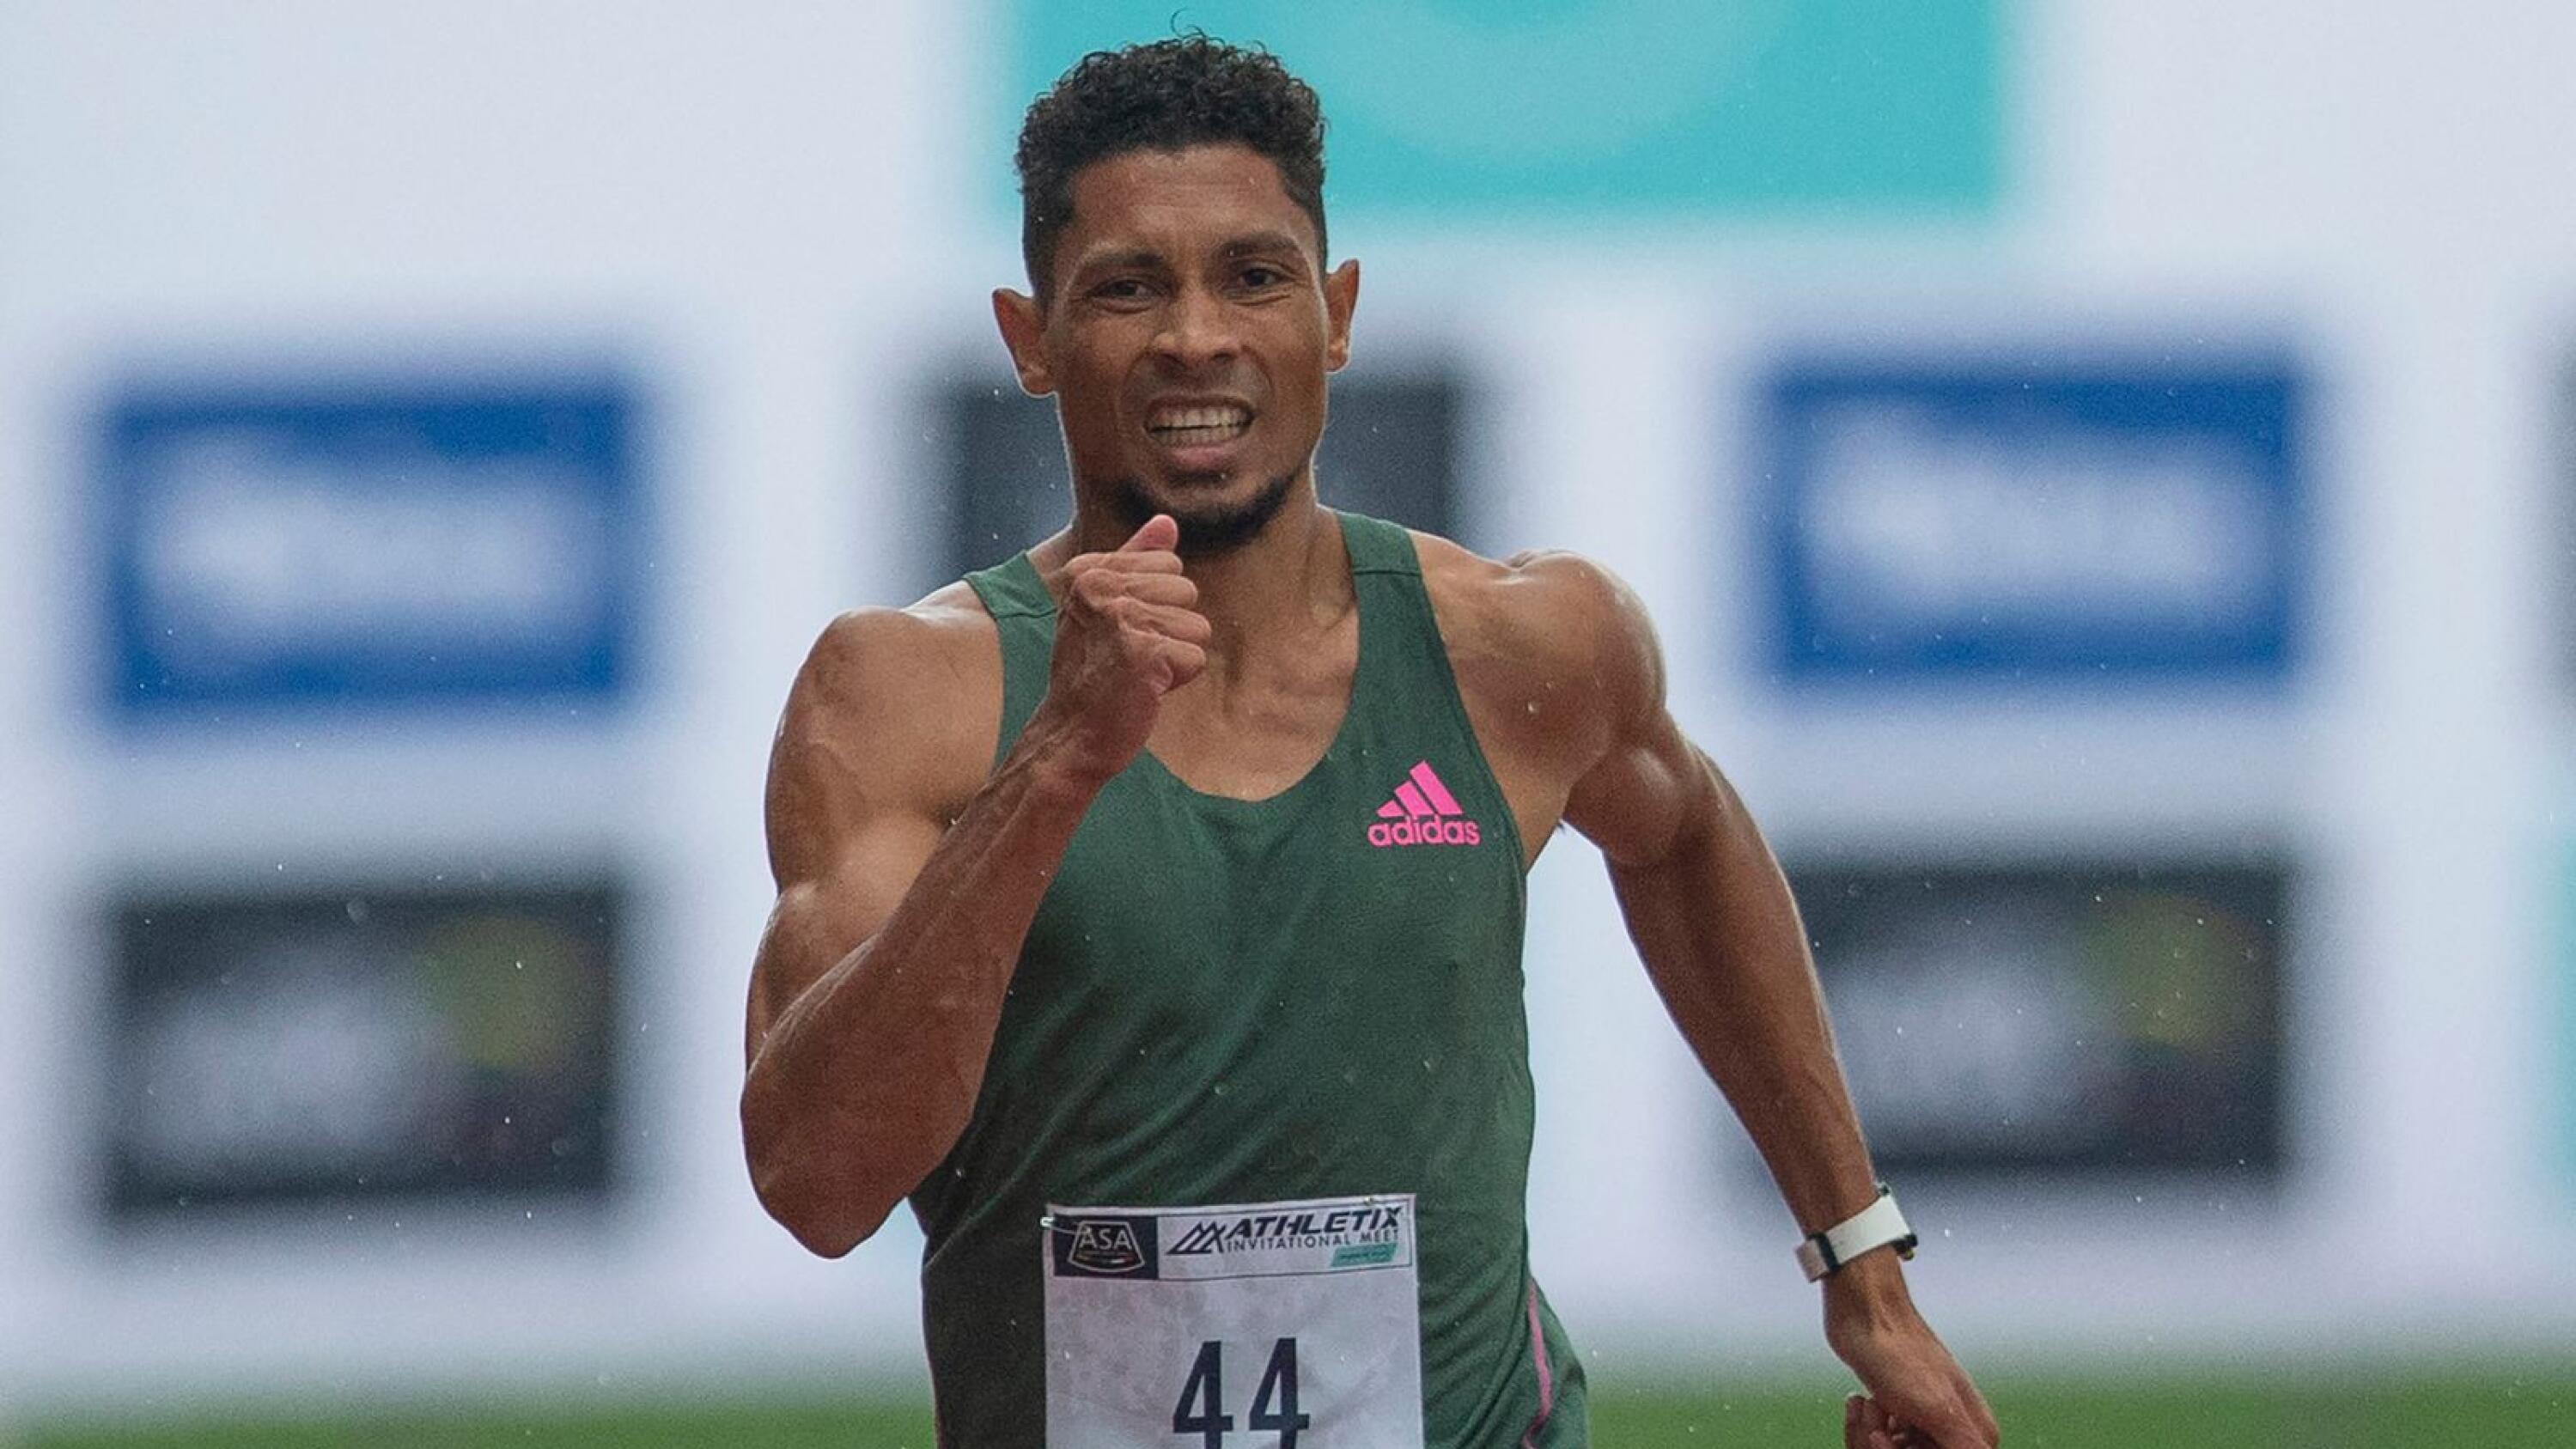 400m world record-holder Wayde van Niekerk finally booked his ticket to the Tokyo Olympics on Saturday night